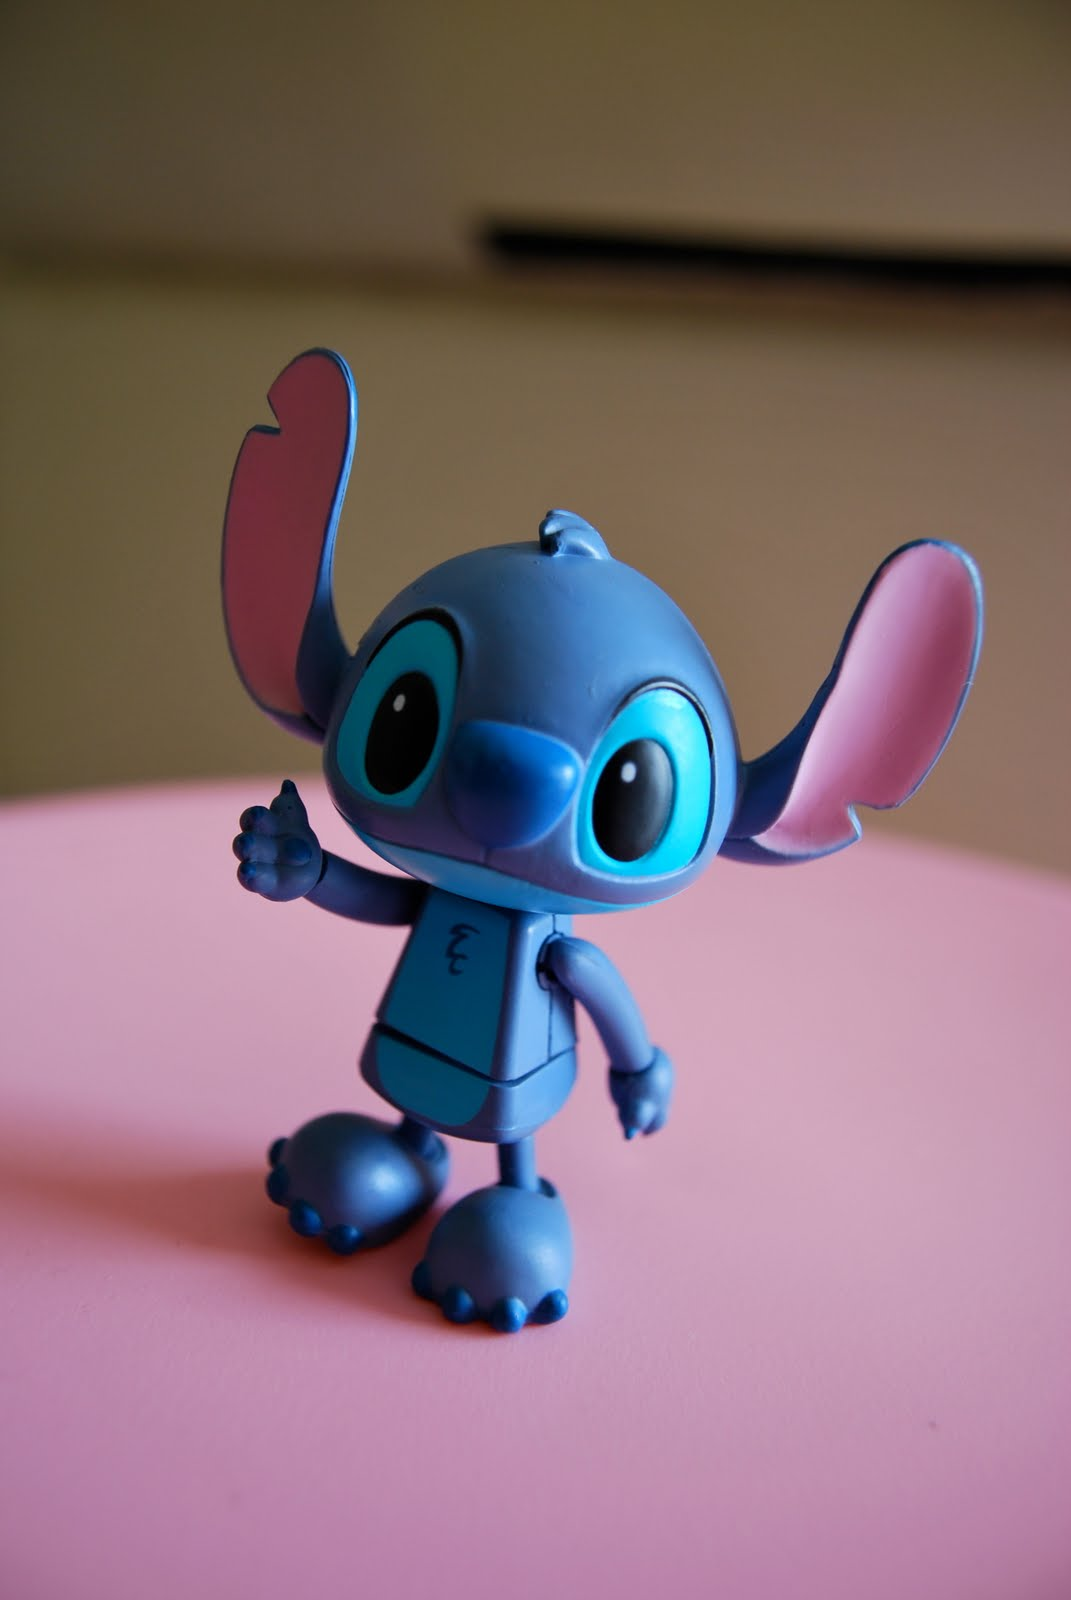 chrystal ☆•*¨*•.¸¸: Cute Little Disney Characters ...